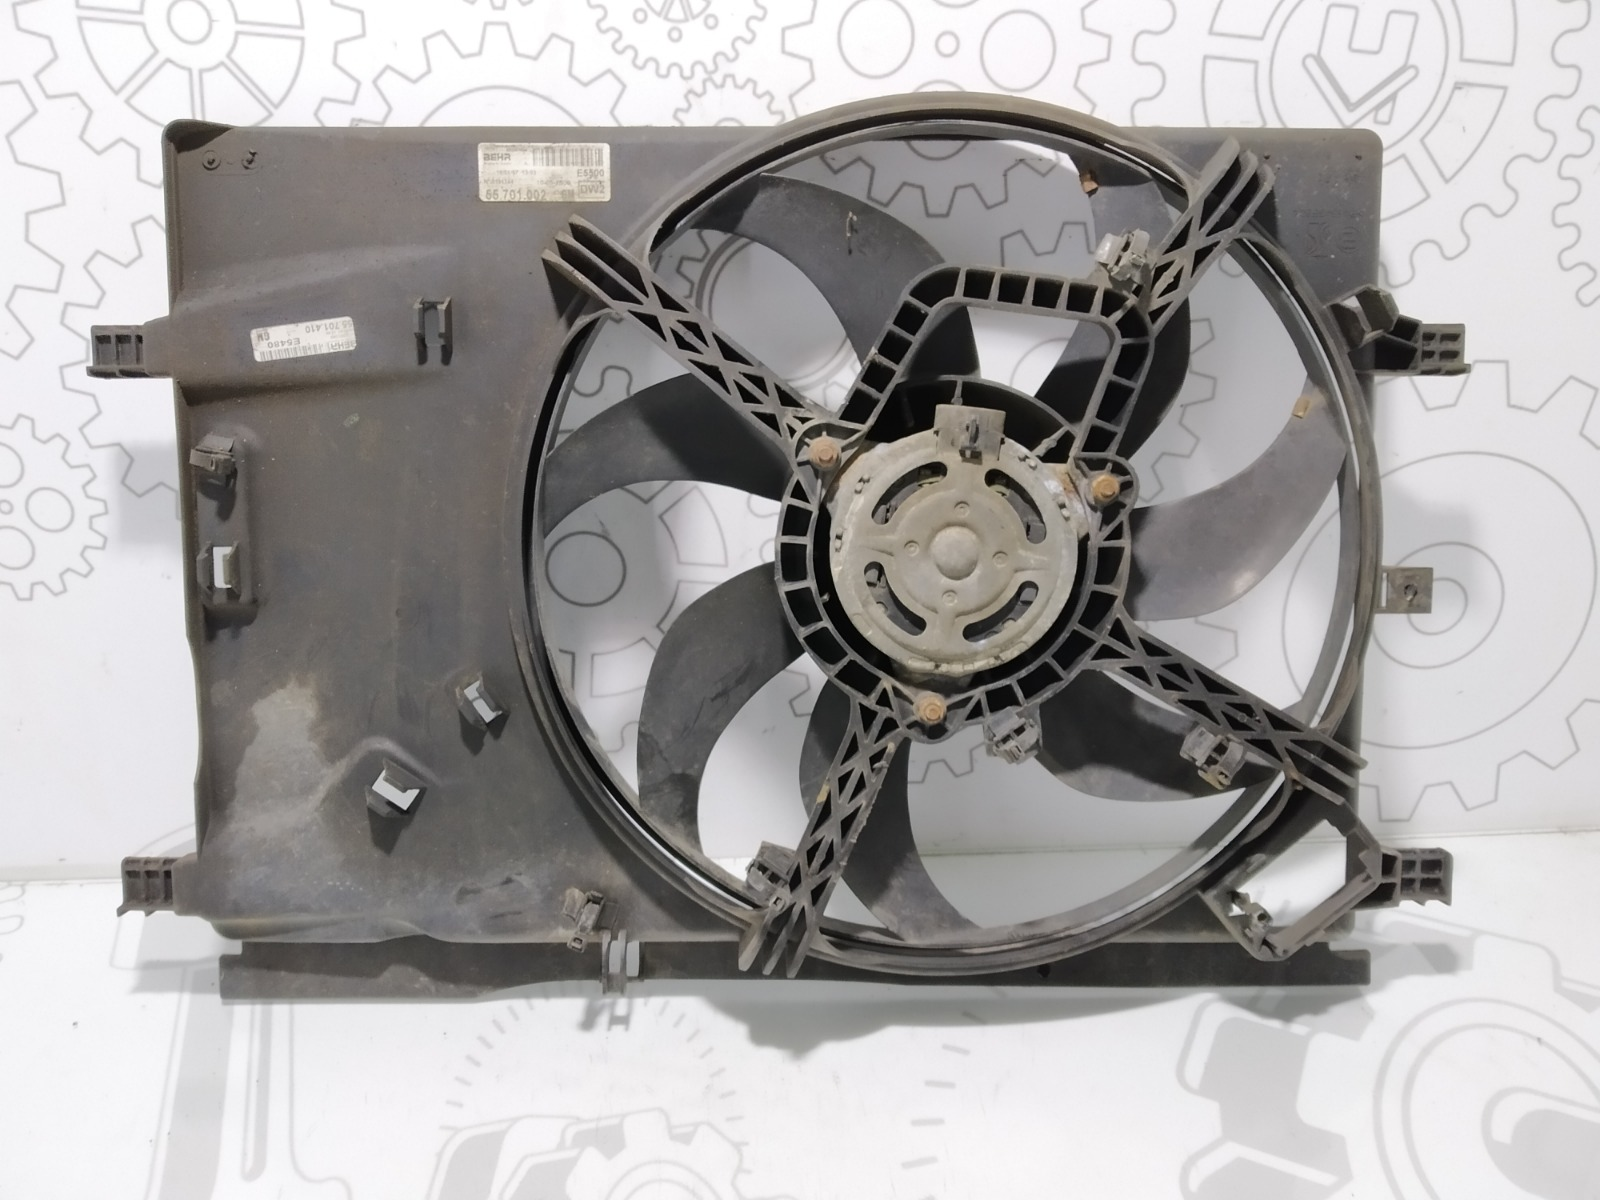 Вентилятор радиатора Opel Corsa D 1.2 I 2007 (б/у)